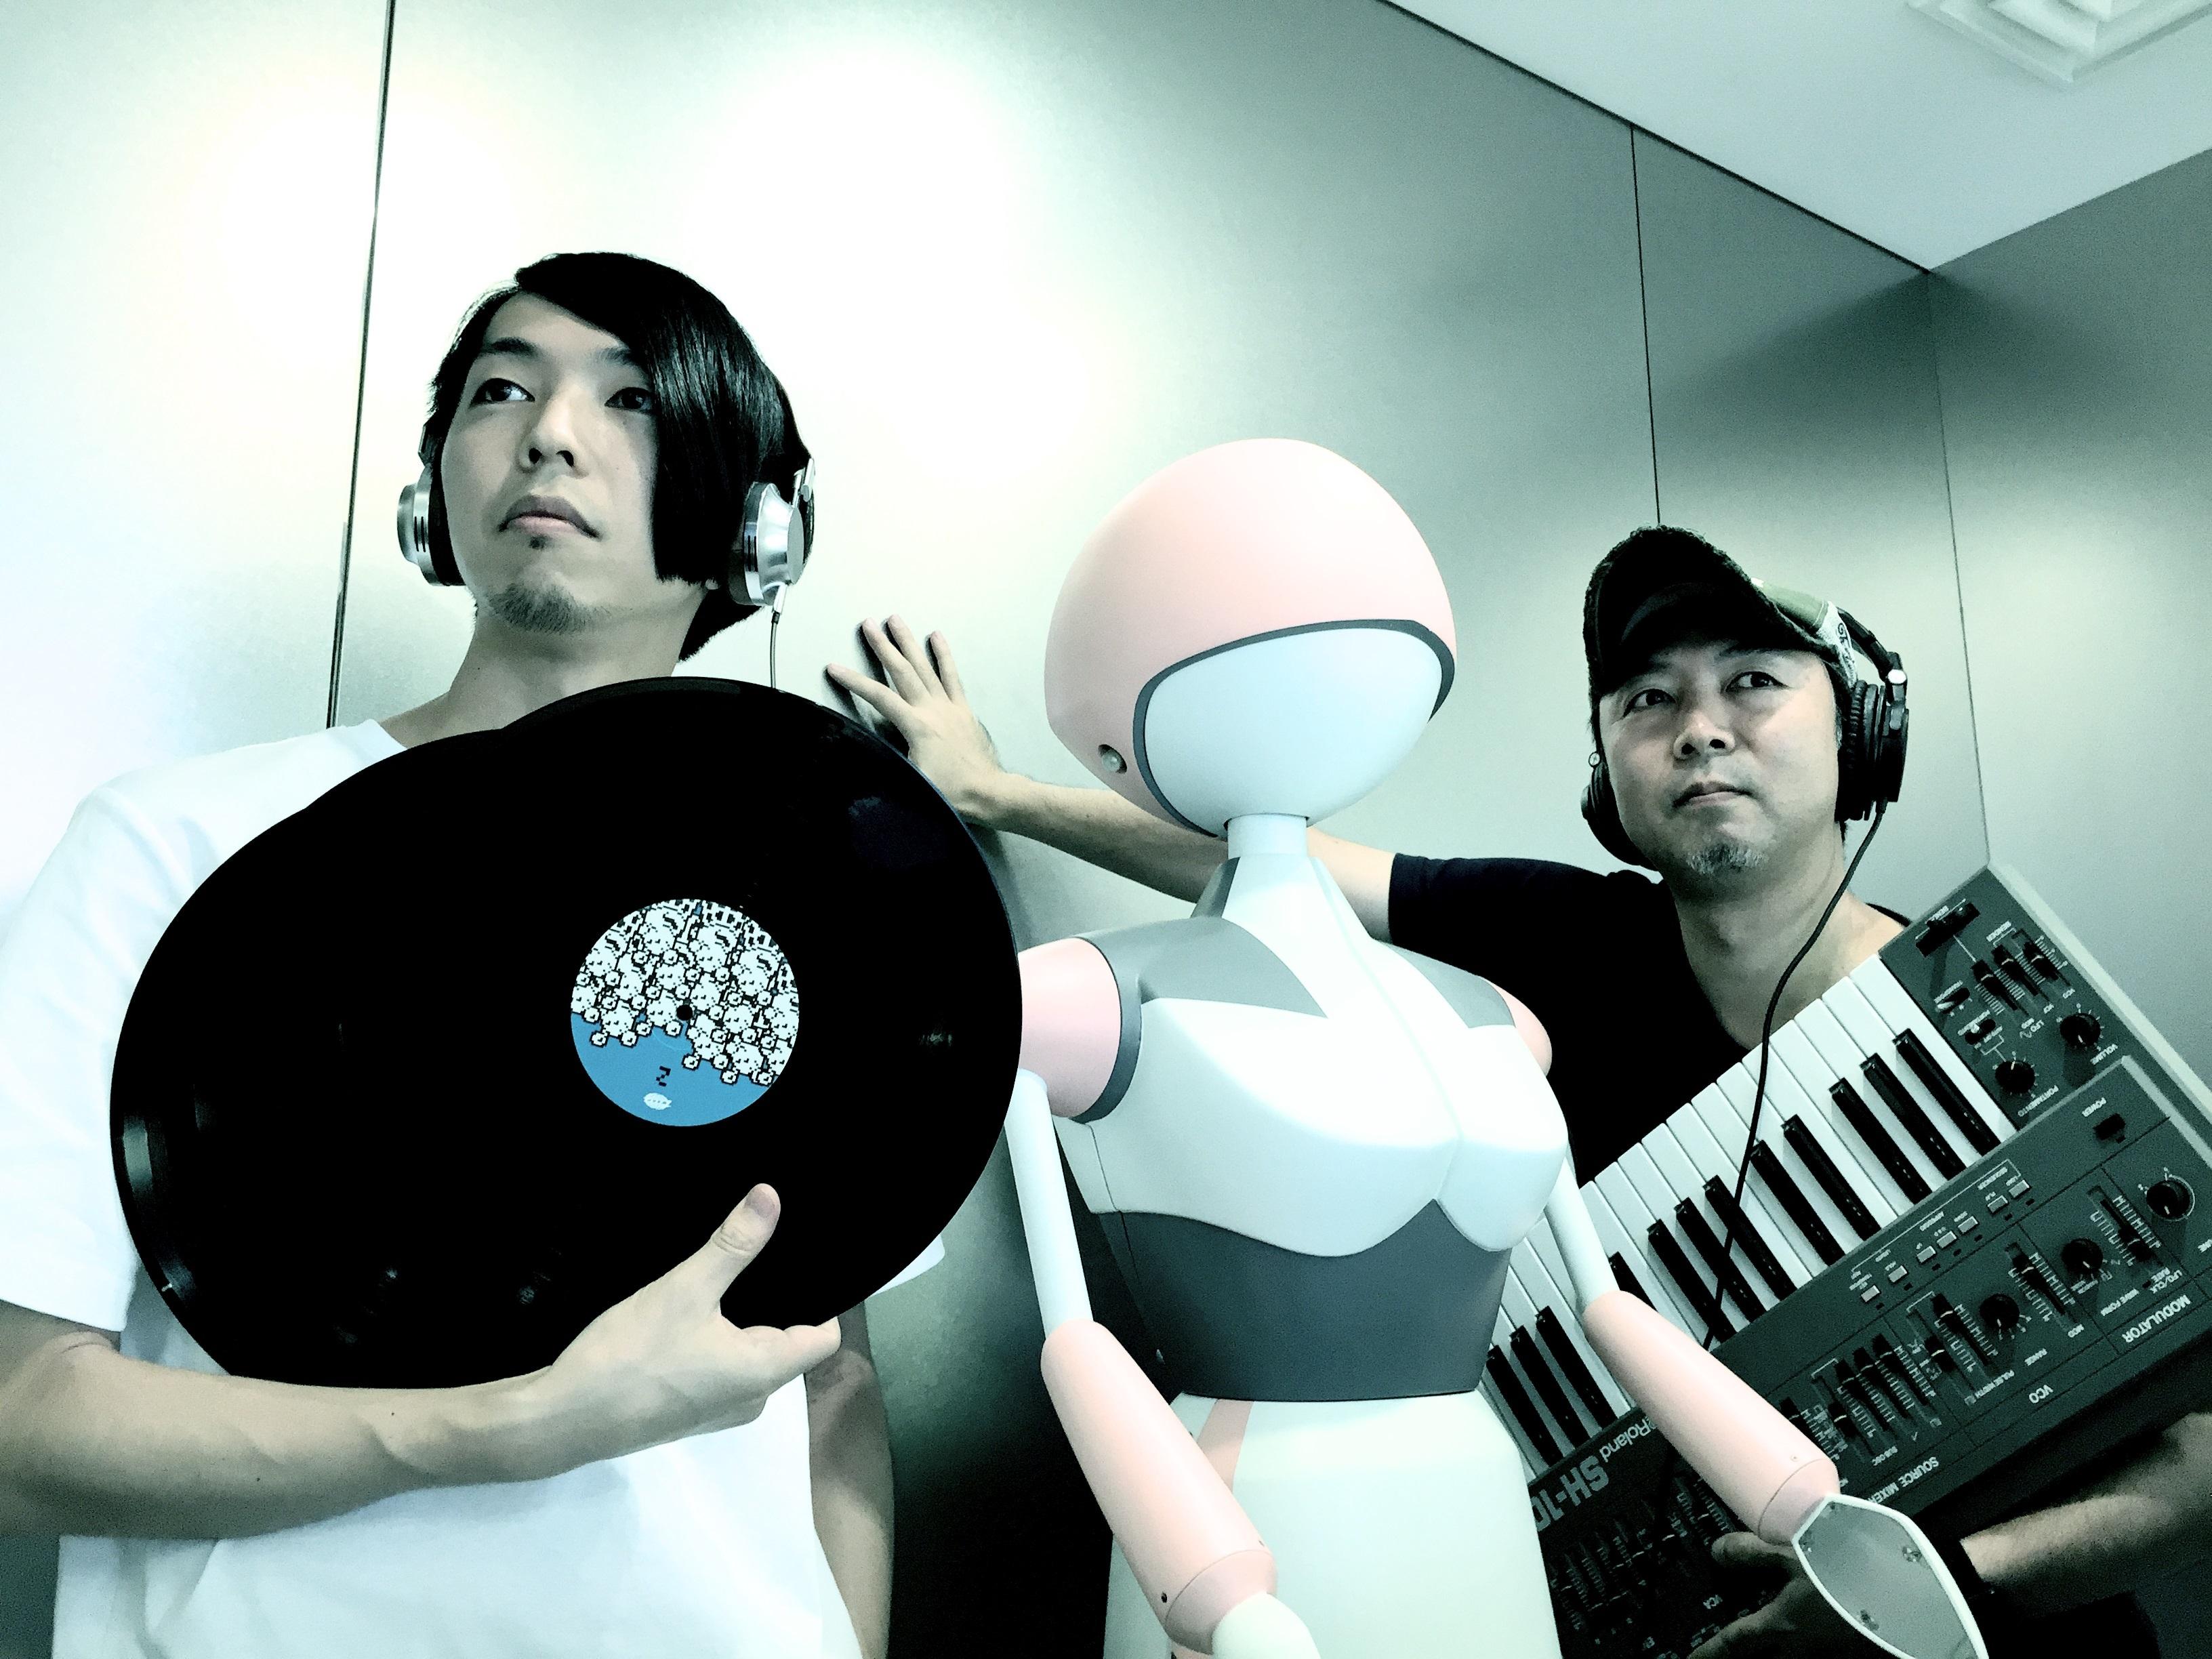 Hiroshi Okubo×Taku Inoue